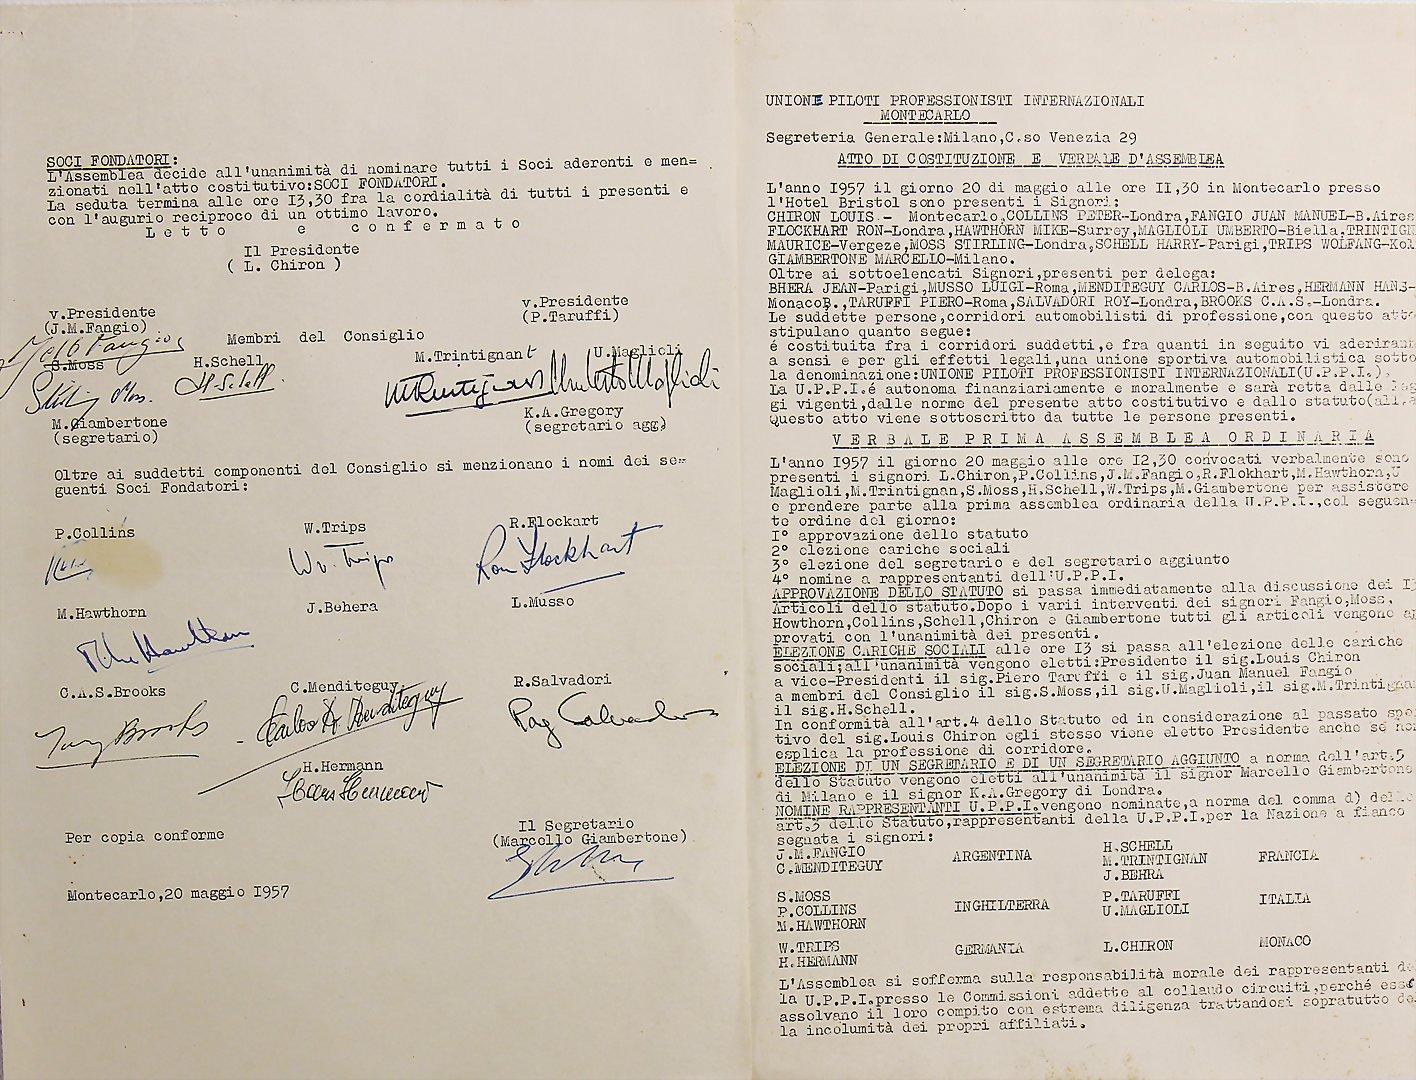 UPPI Monte Carlo 20. Mai 1957 - Zuschlag 23.500 €